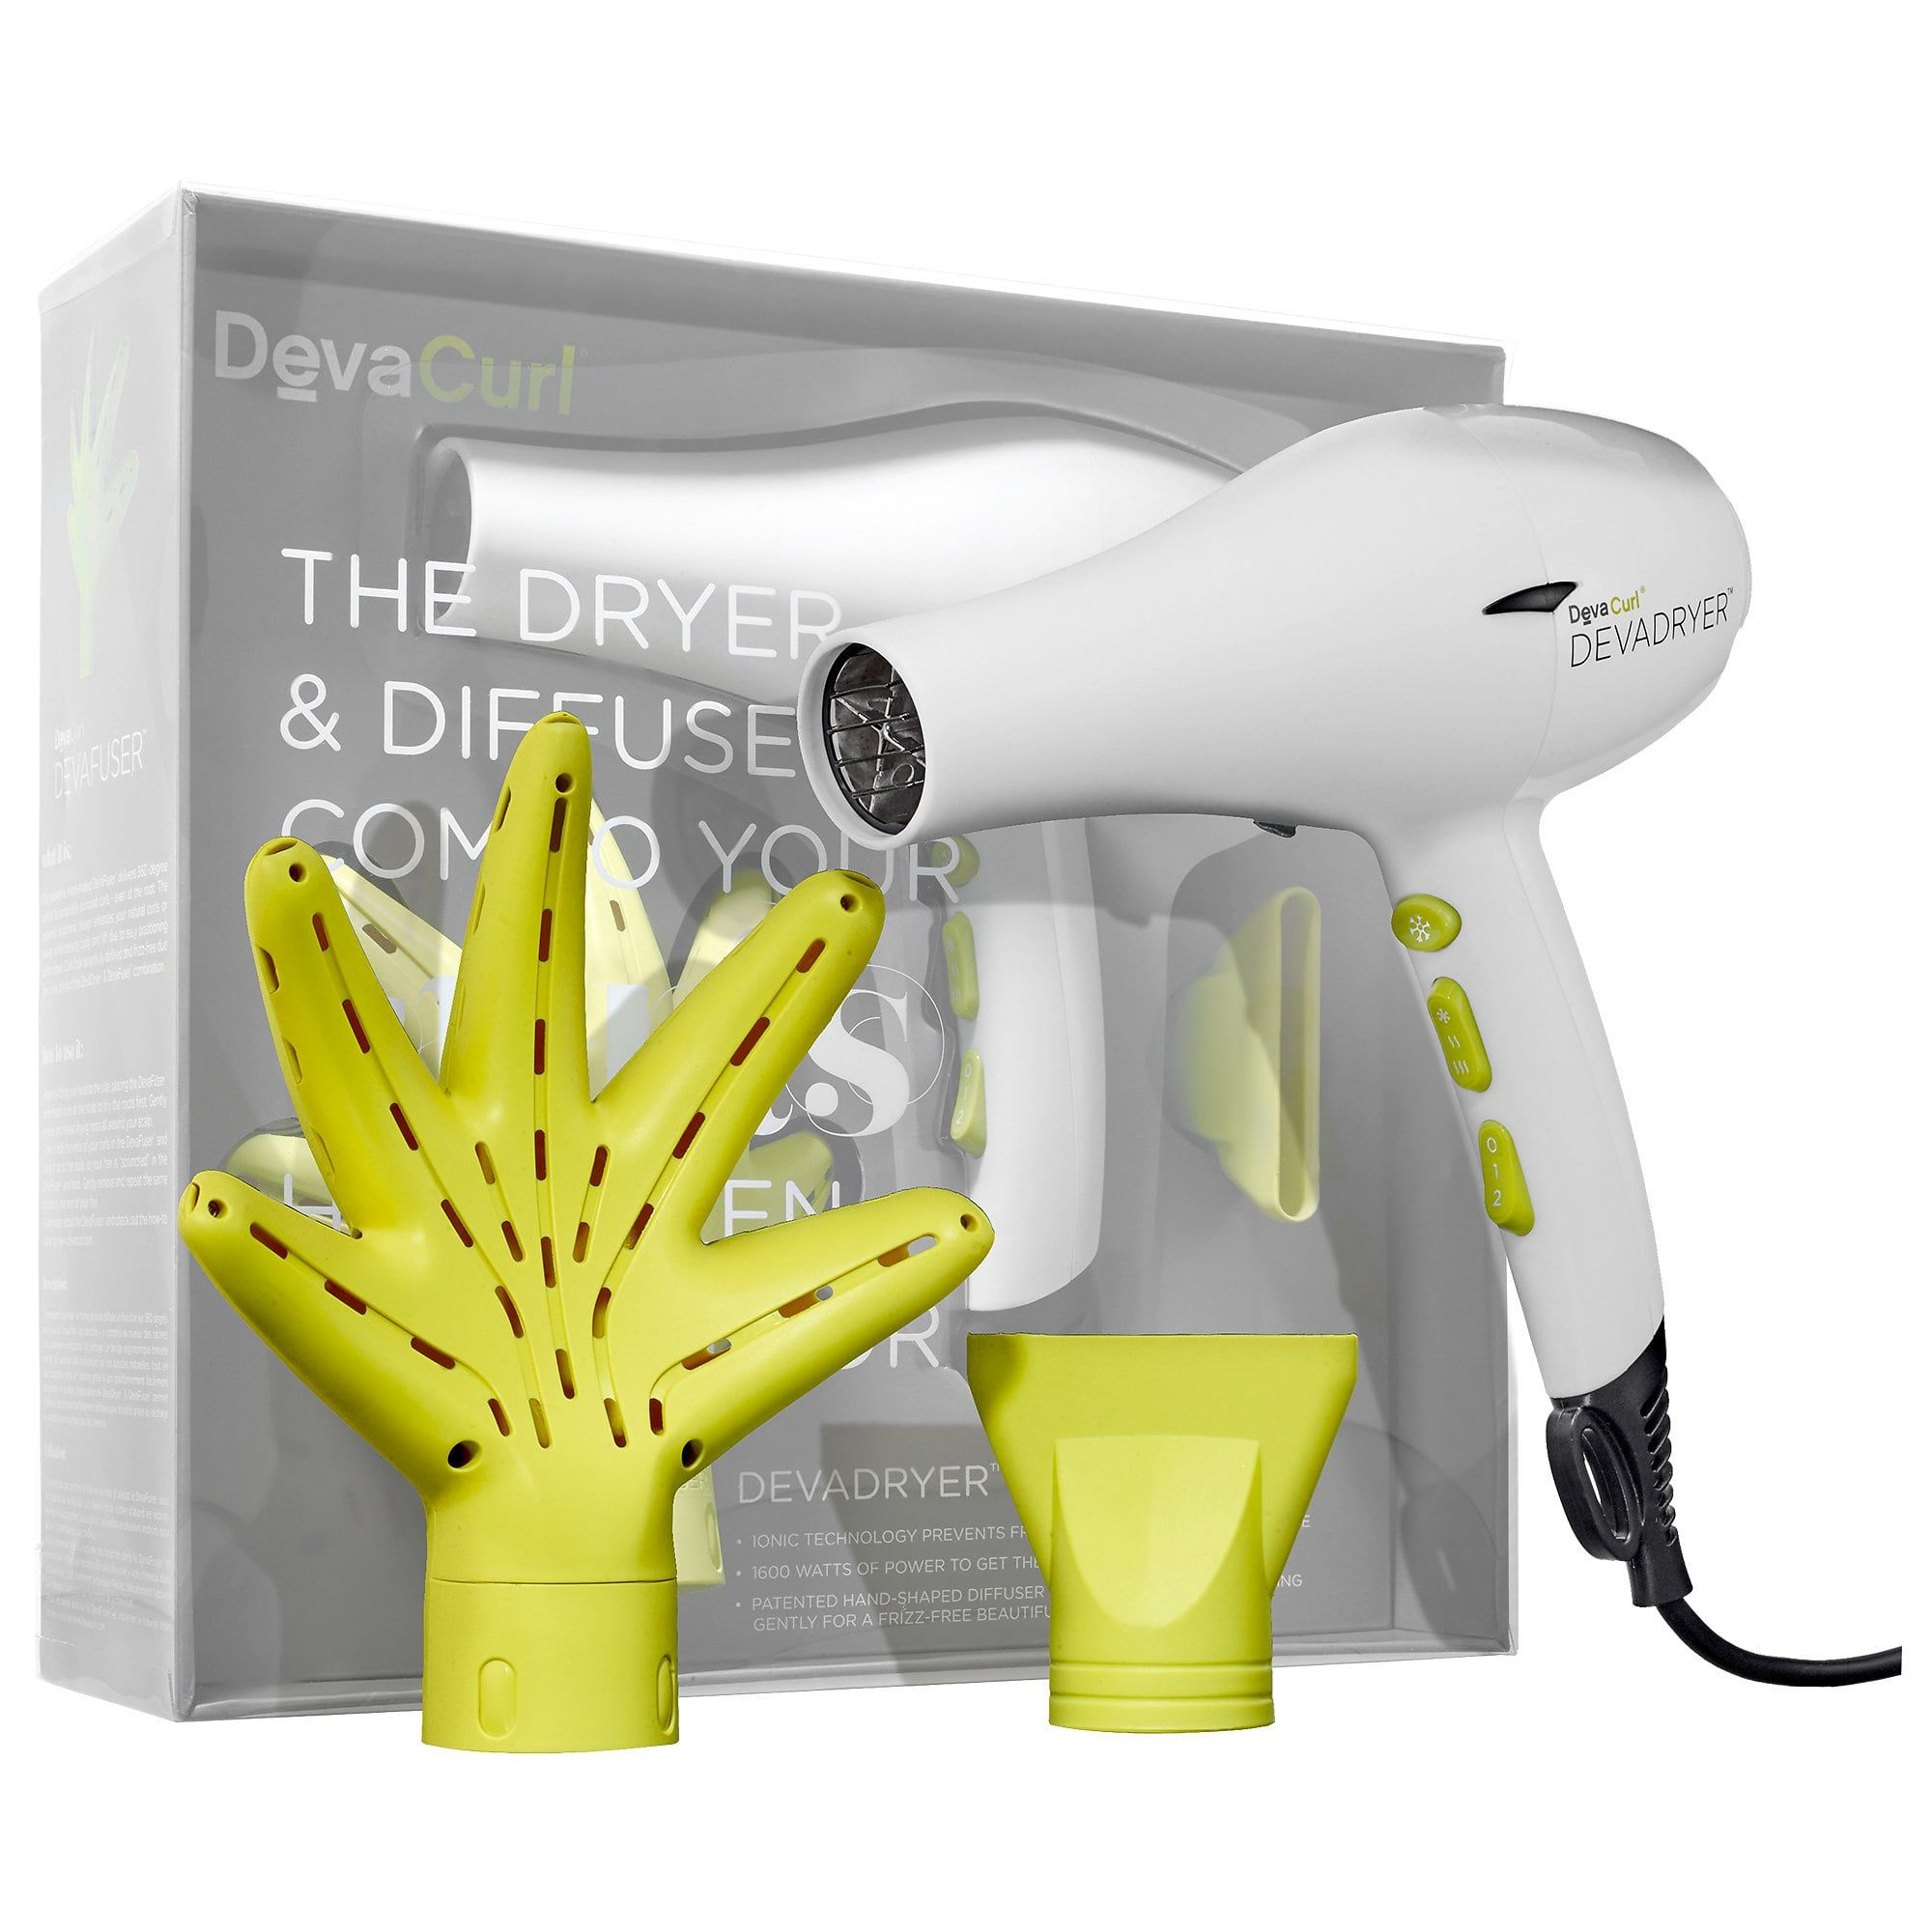 DEVADRYER™ & DEVAFUSER™ Dryer & Diffuser Combo For All